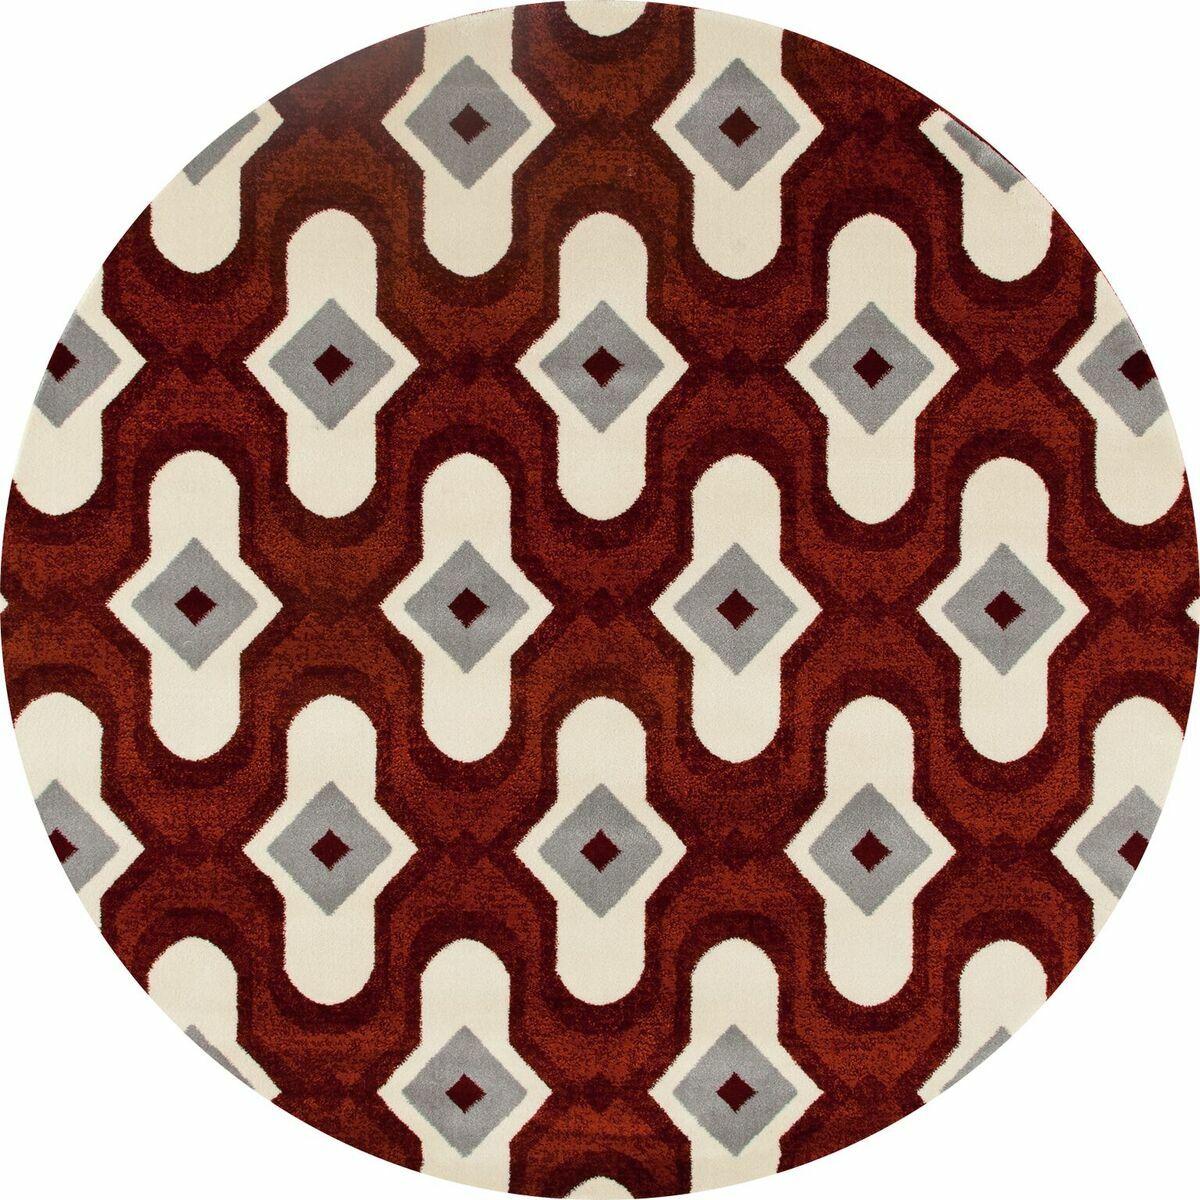 West Hewish Burgundy/Beige Area Rug Rug Size: 3'11 x 5'7